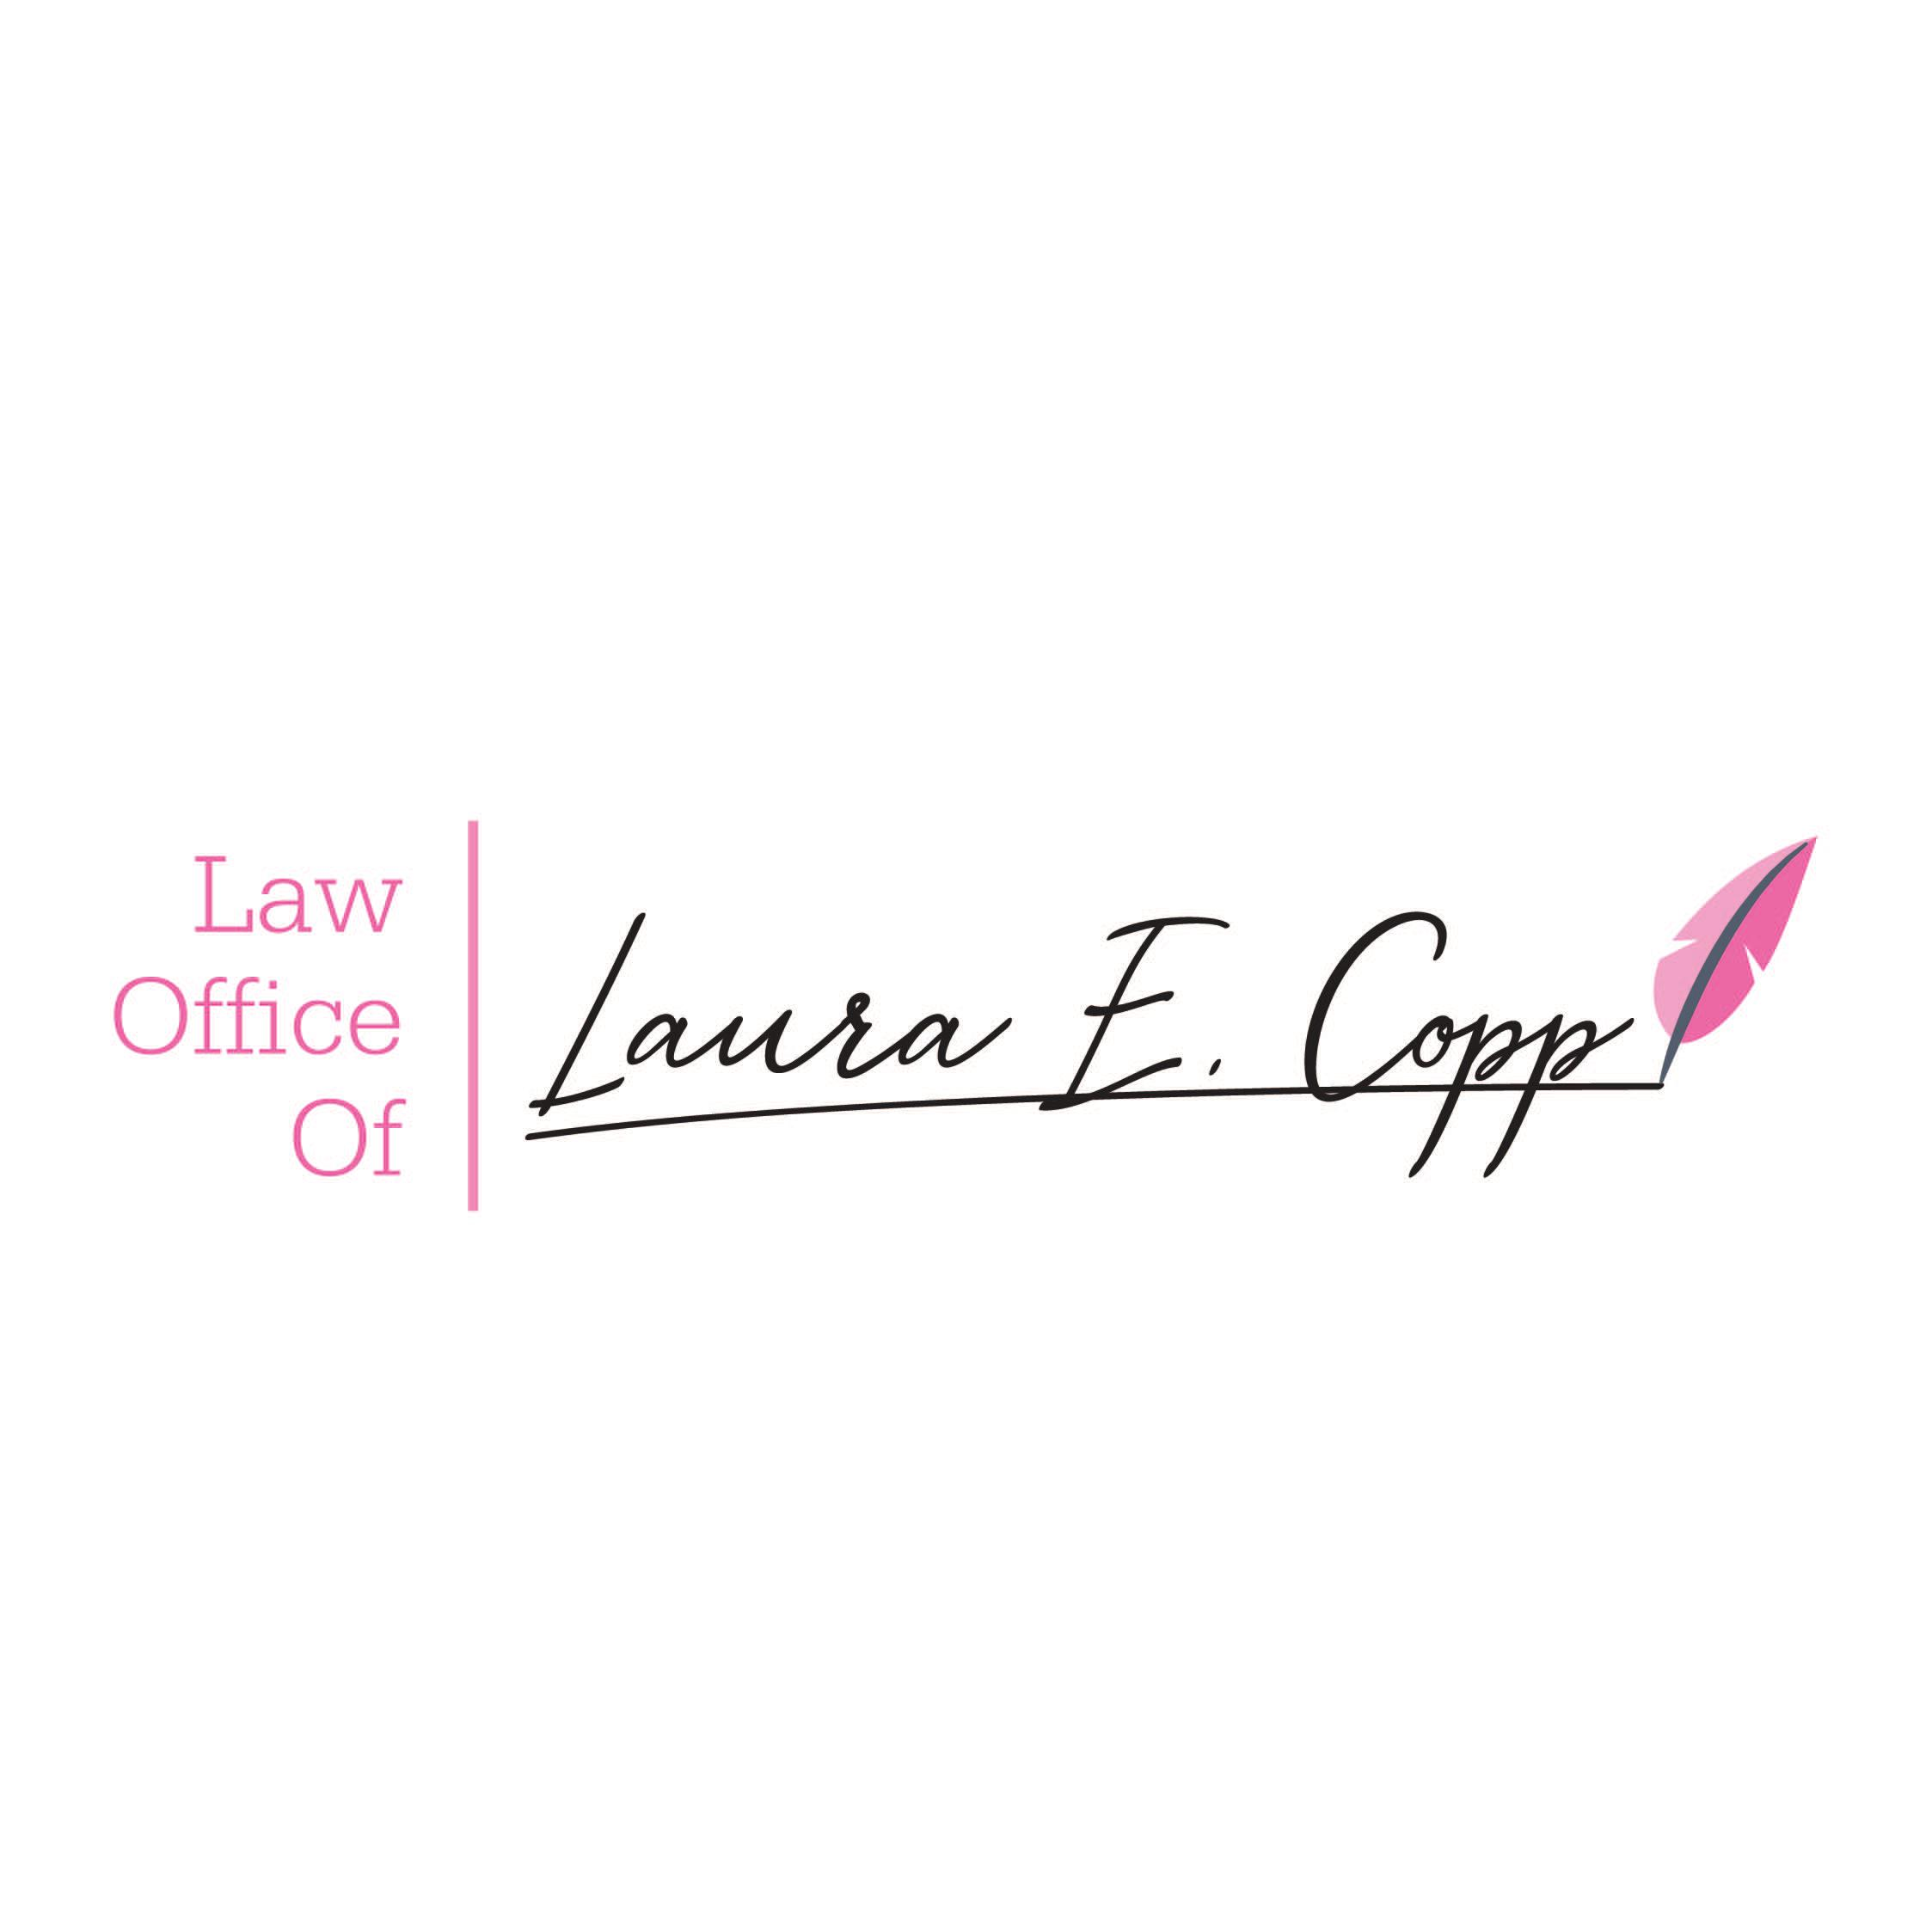 Law Office of Laura E. Copp